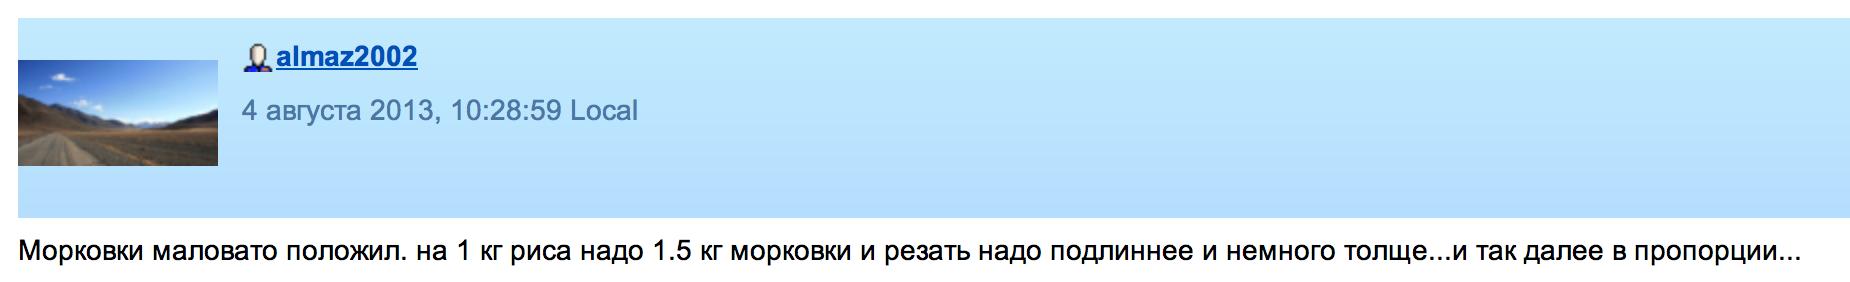 Снимок экрана 2013-08-04 в 12.09.07